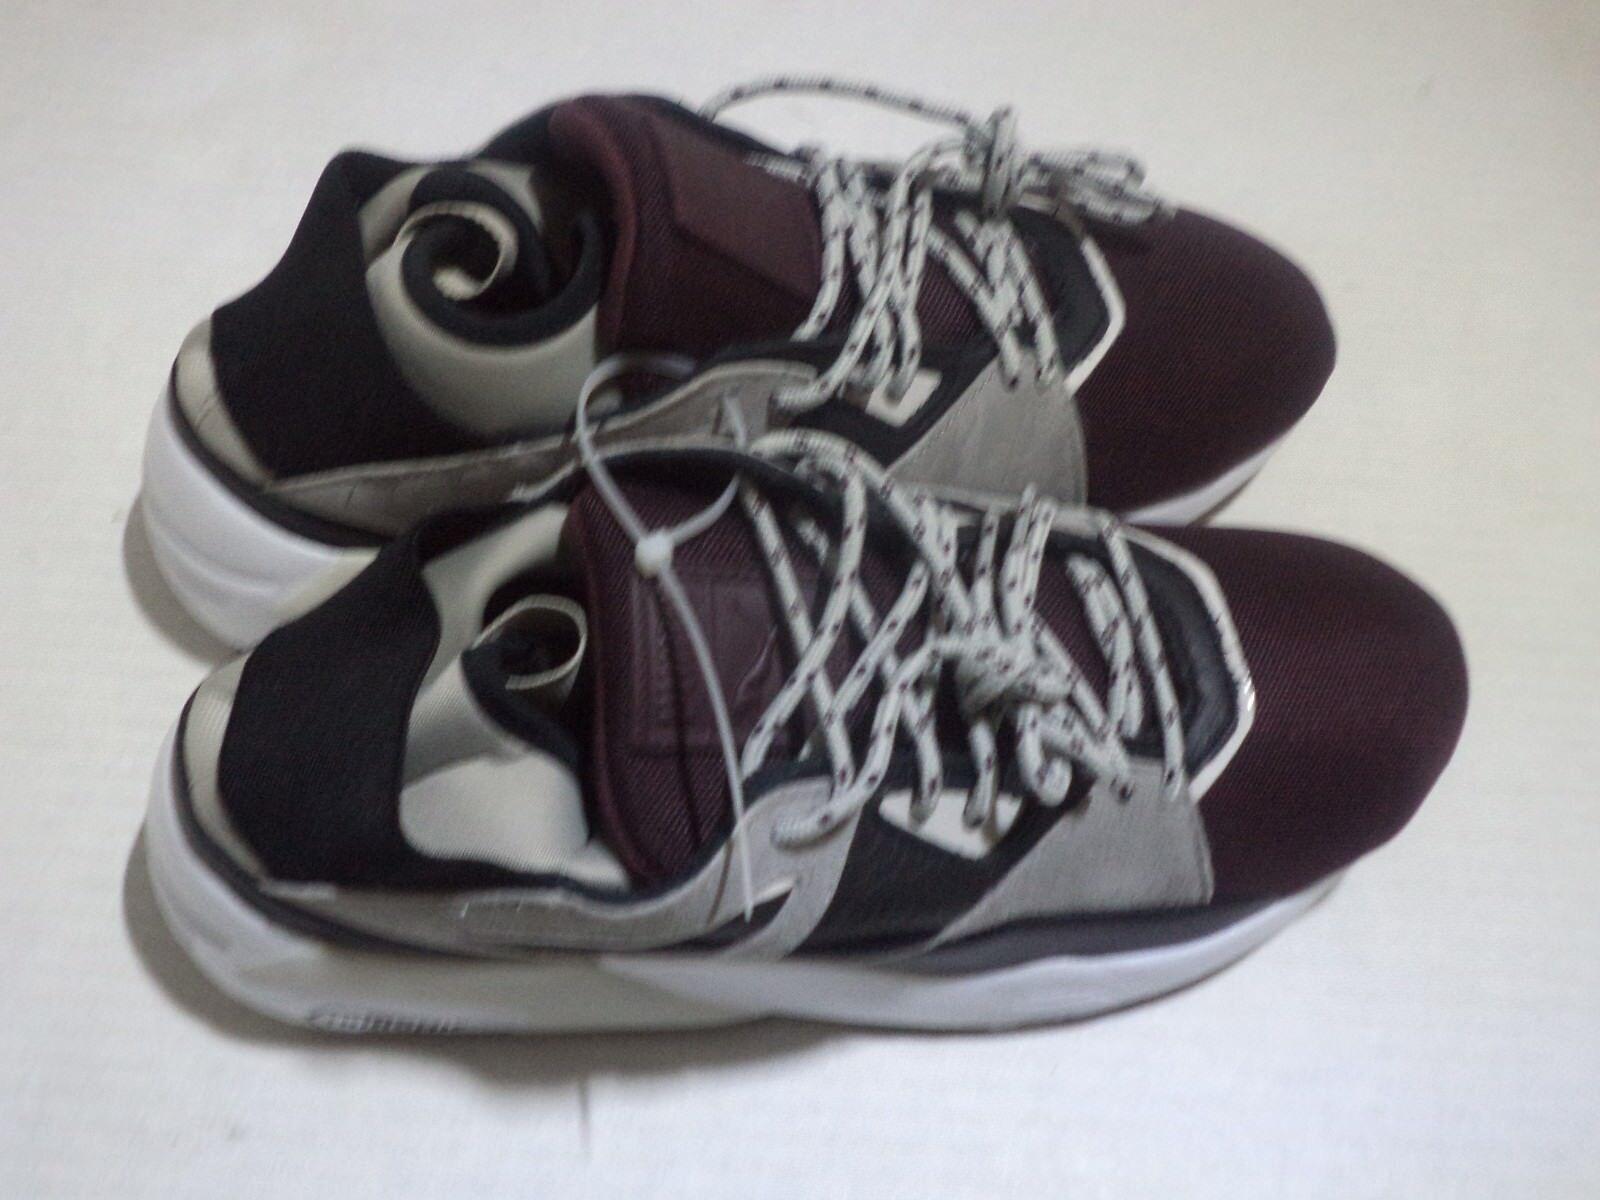 Puma Hombre Bog Bog Hombre Sock elemental Fashion sneaker comoda marca de descuento 2666db